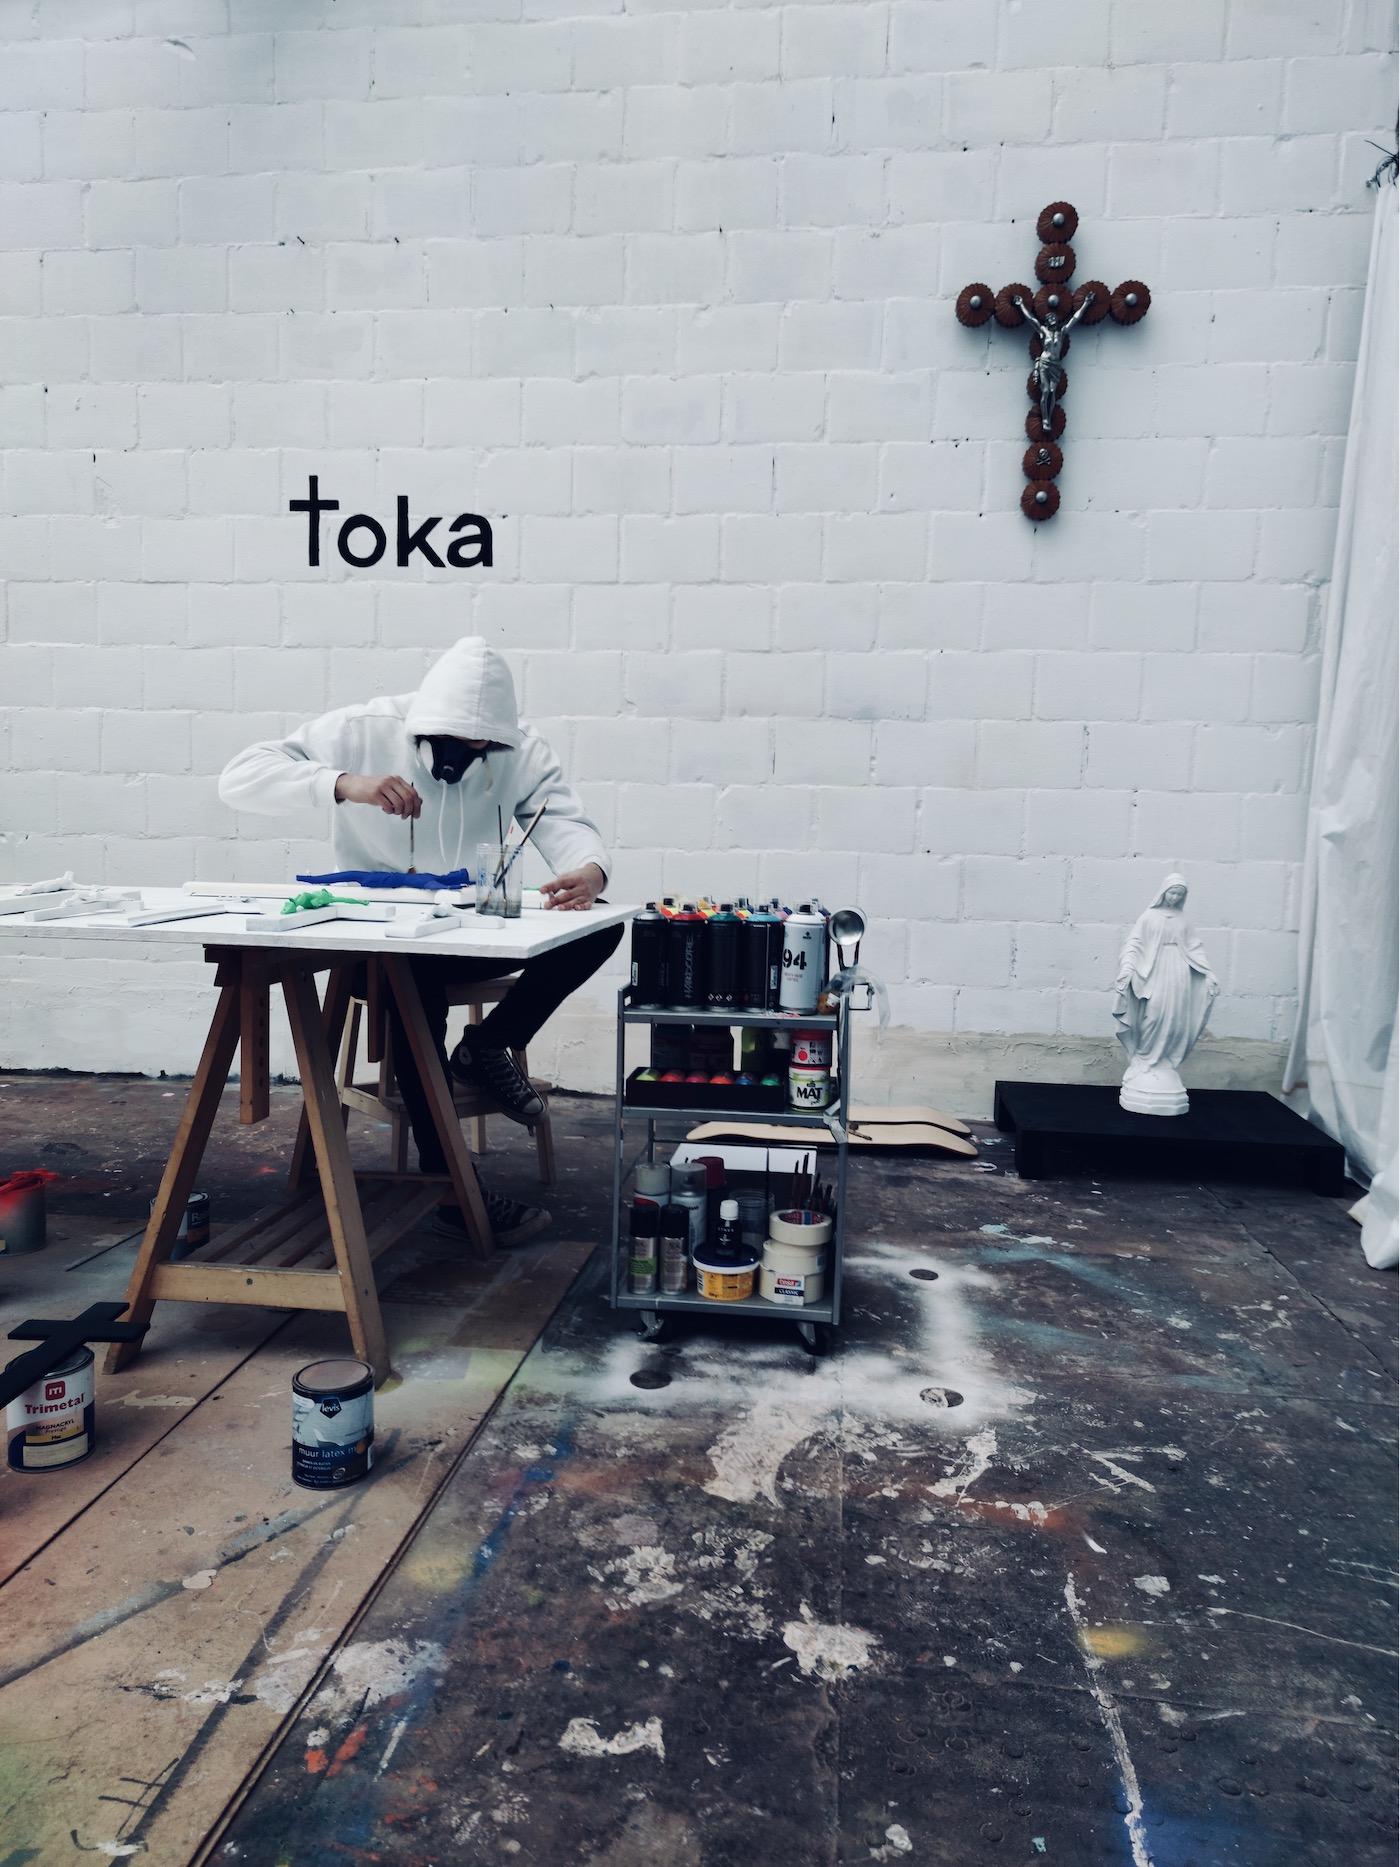 Toka at Affordable Art Fair Brussels 2020